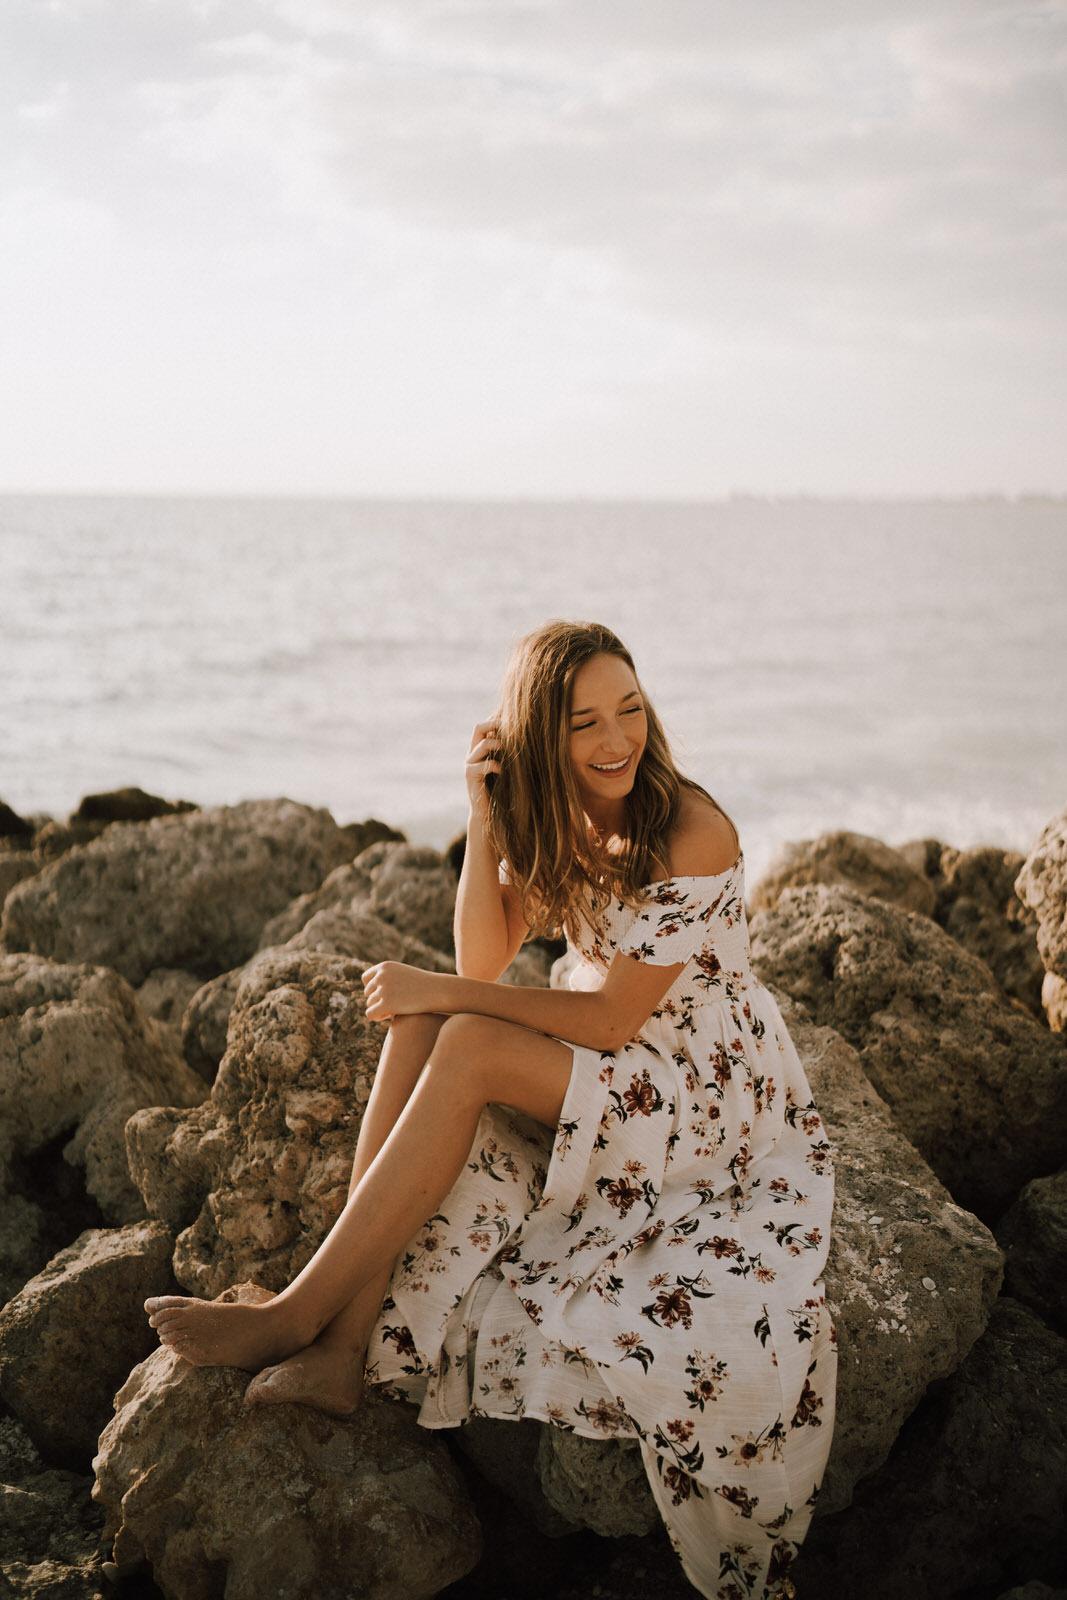 Fort Myers Senior Photos on Bonita Beach - Michelle Gonzalez Photography - Sammie-30.JPG